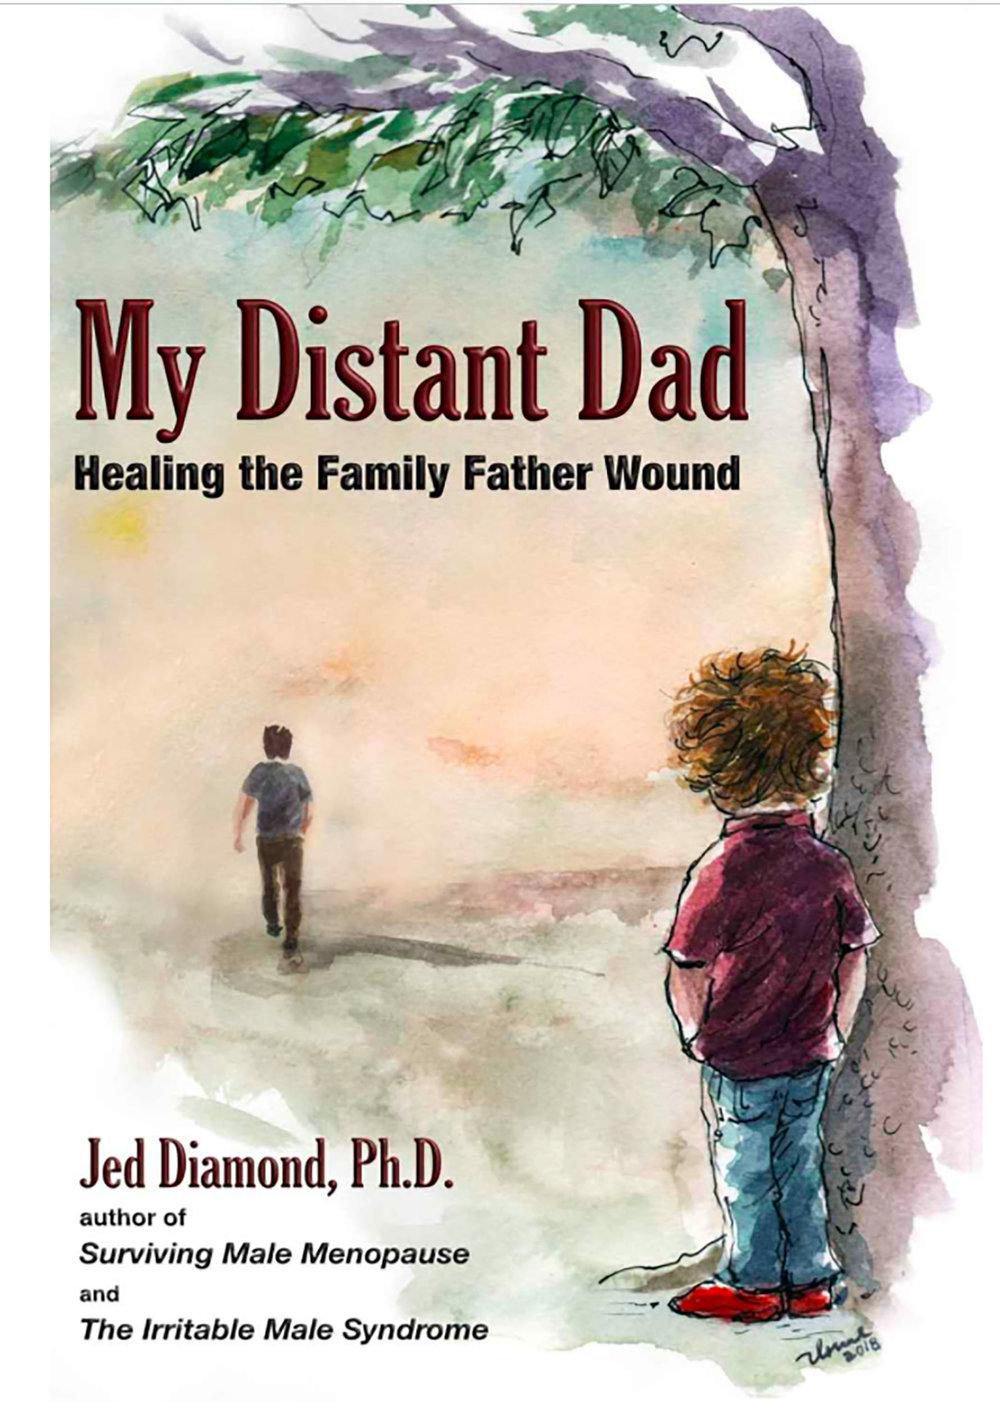 SS_Distant-Dad.jpg